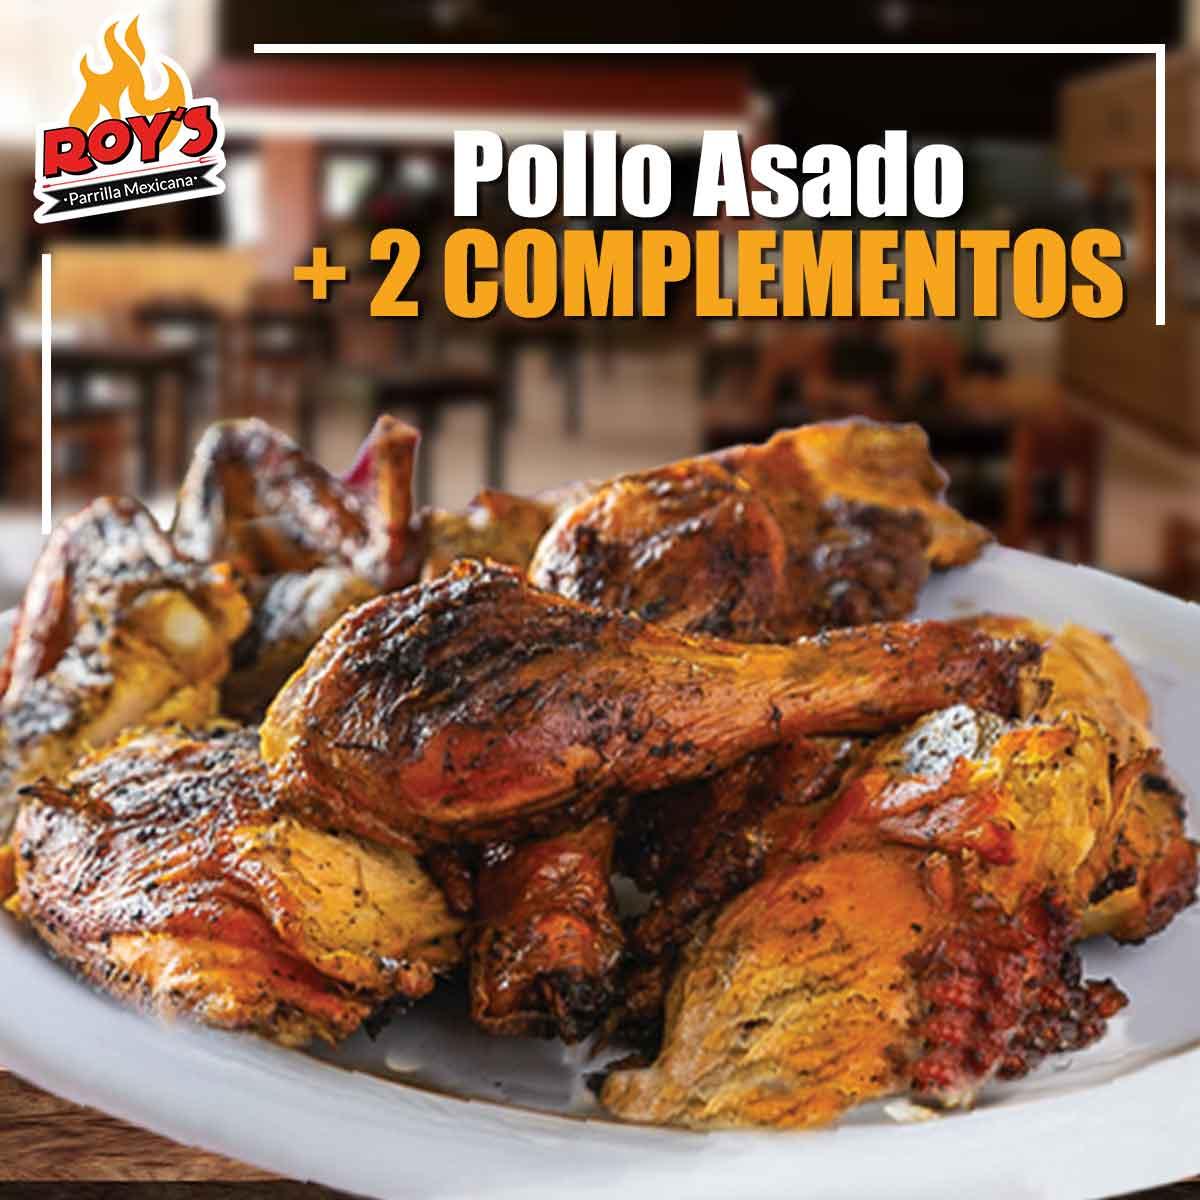 Pollo Asado al Carbón + 2 Complementos